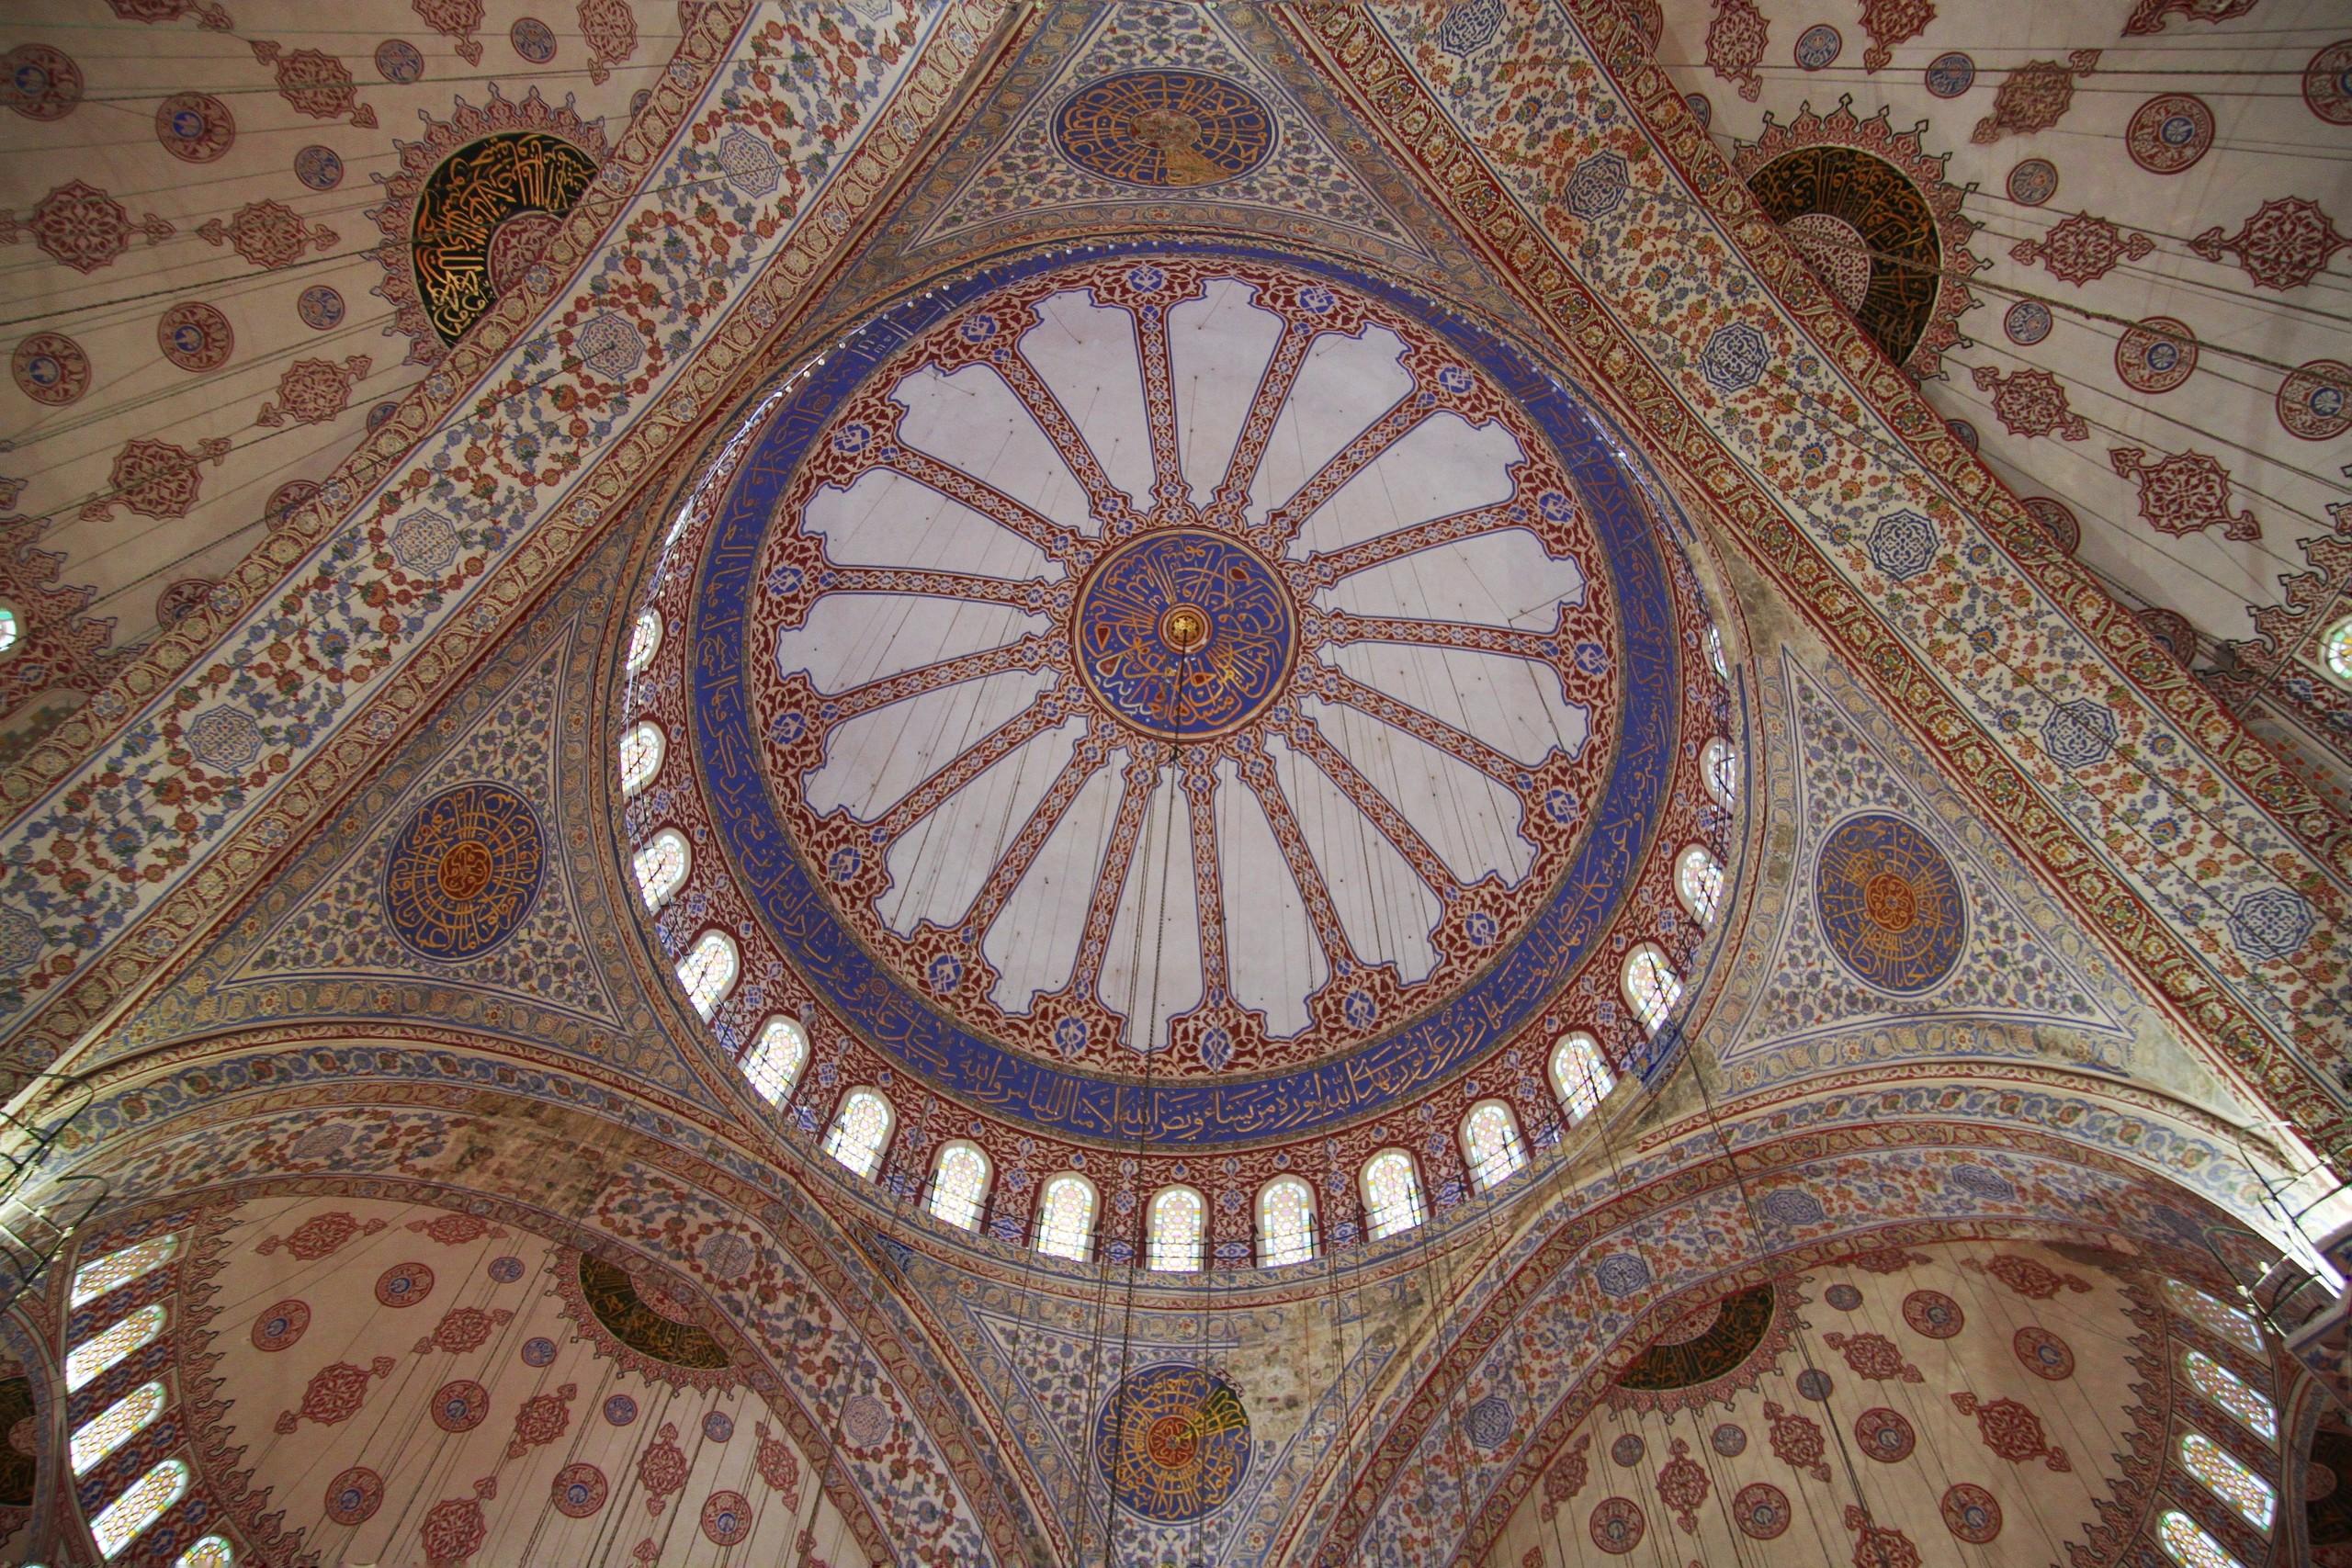 Pırlantadan Kubbeler #5: Sultanahmed - v4A394 - Pırlantadan Kubbeler #5: Sultanahmed